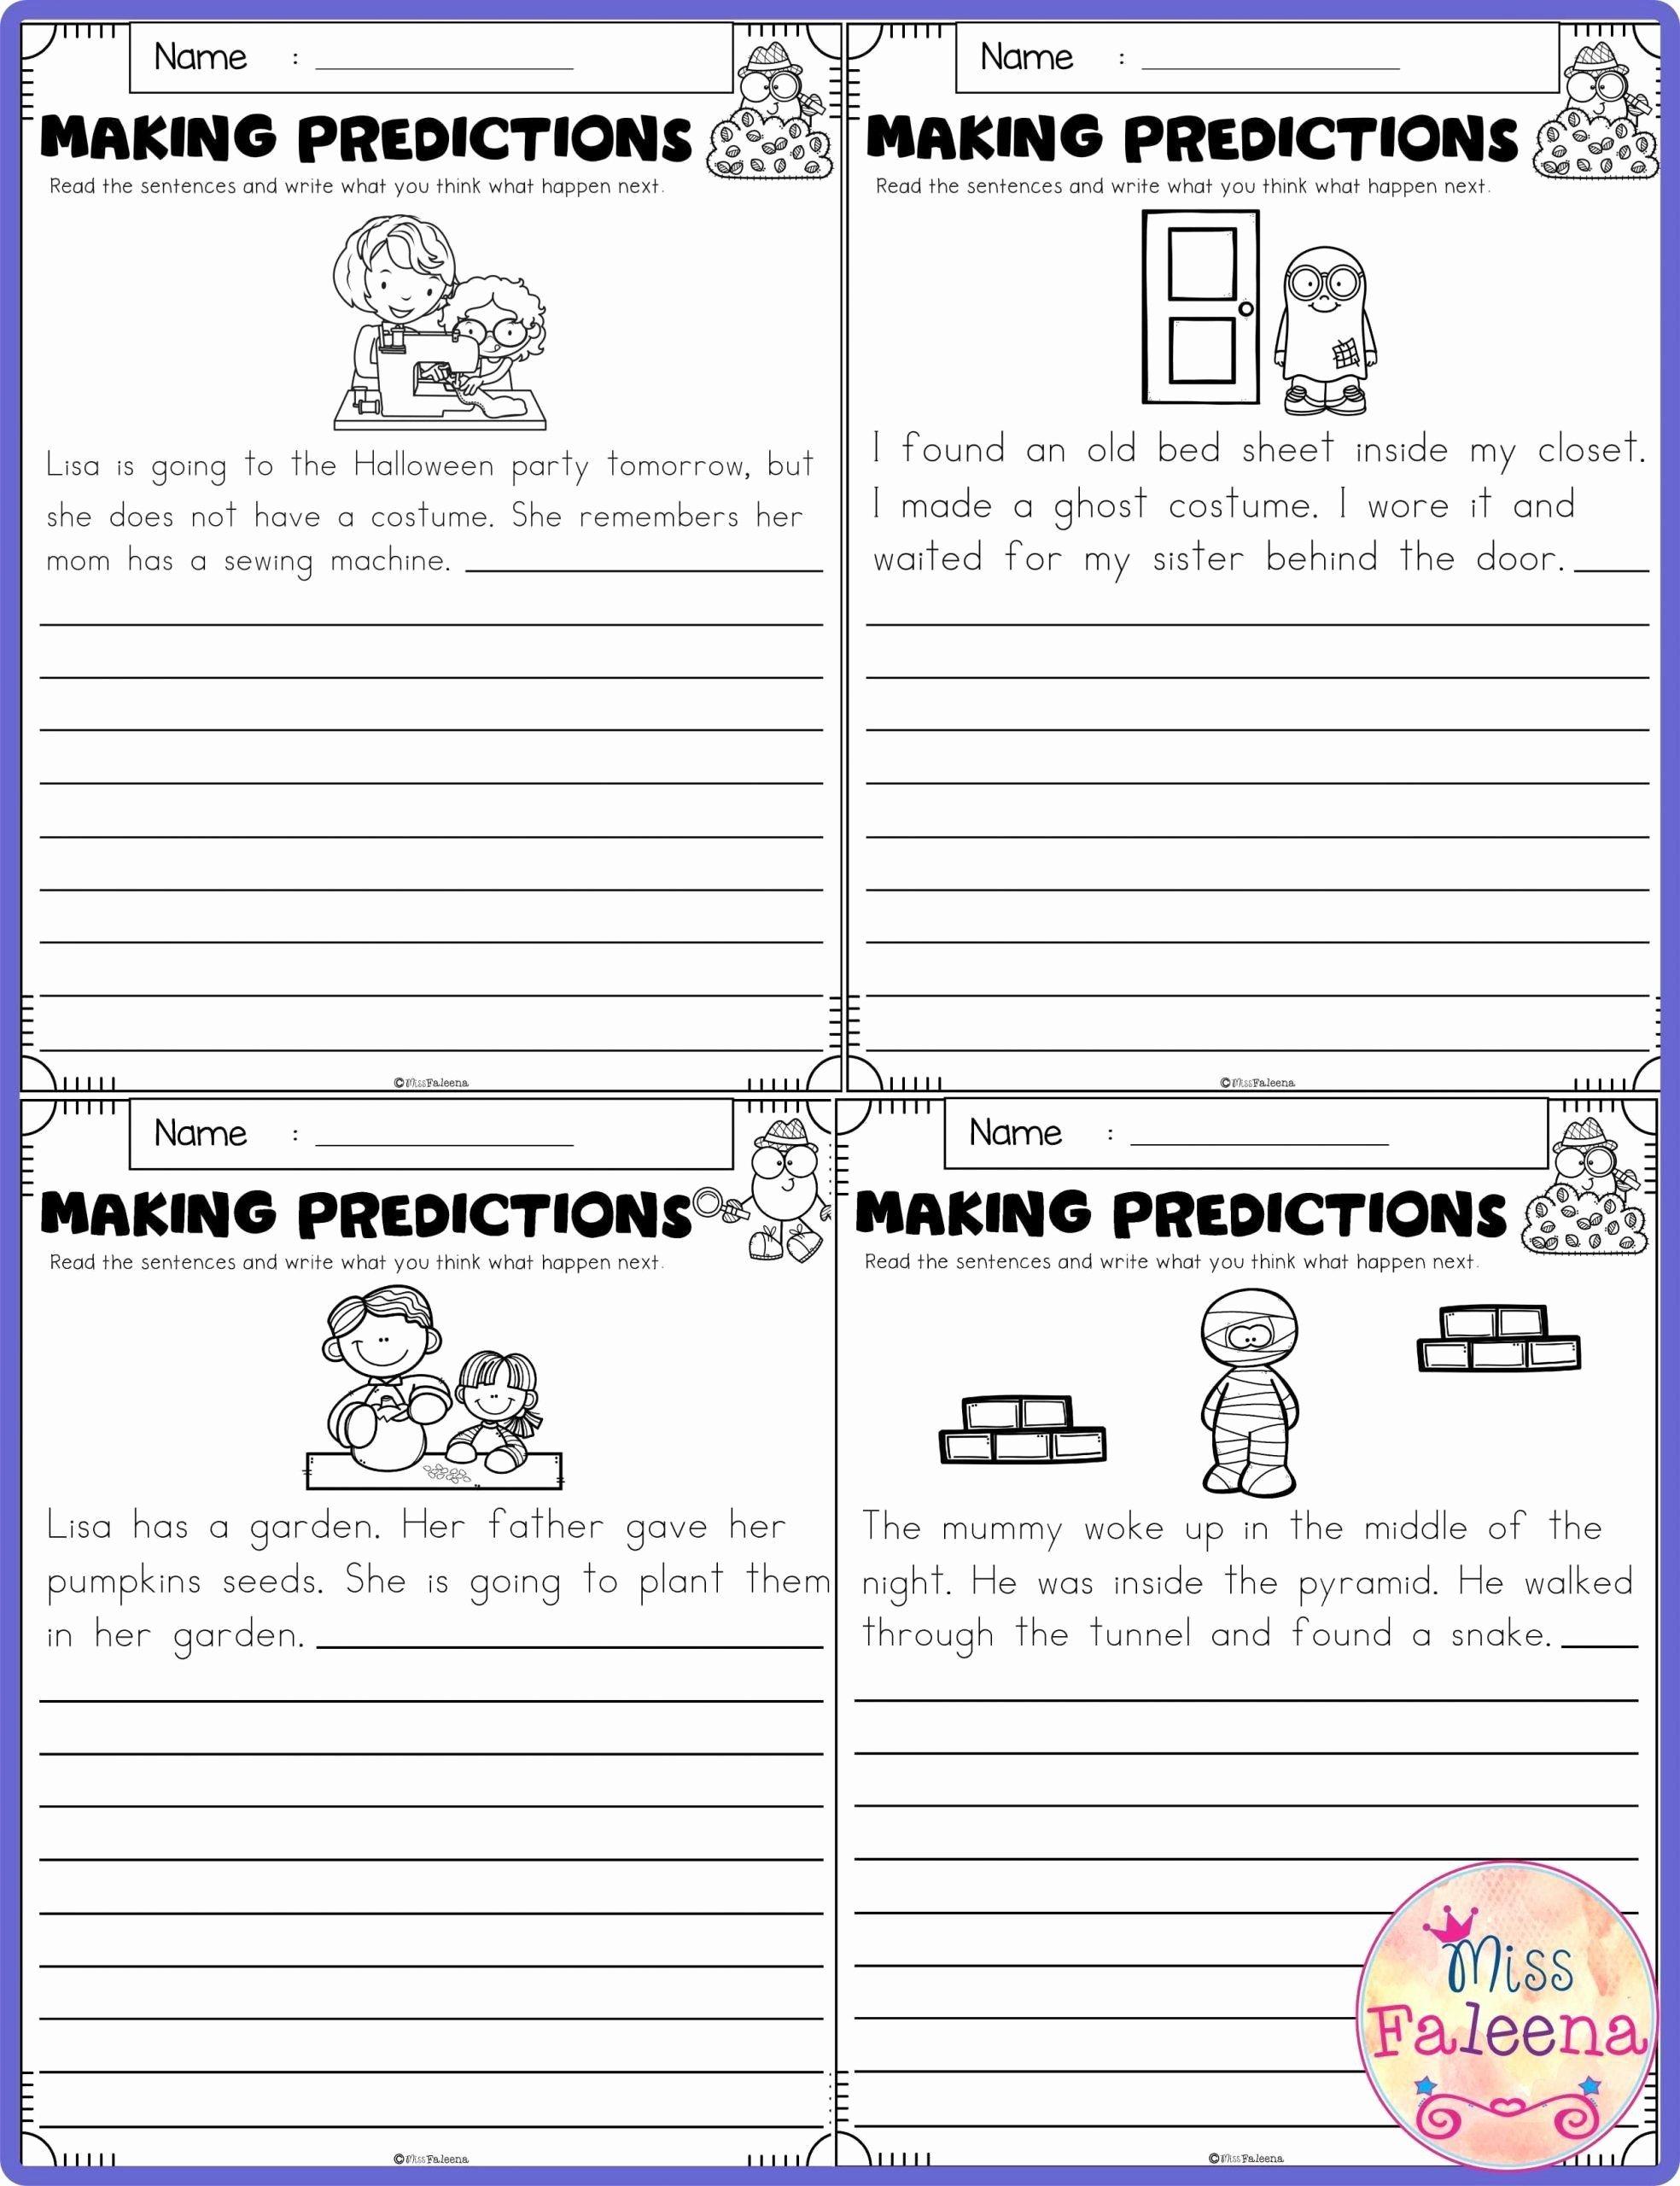 Prediction Worksheets for 3rd Grade Fresh Predictions Worksheets 3rd Grade In 2020